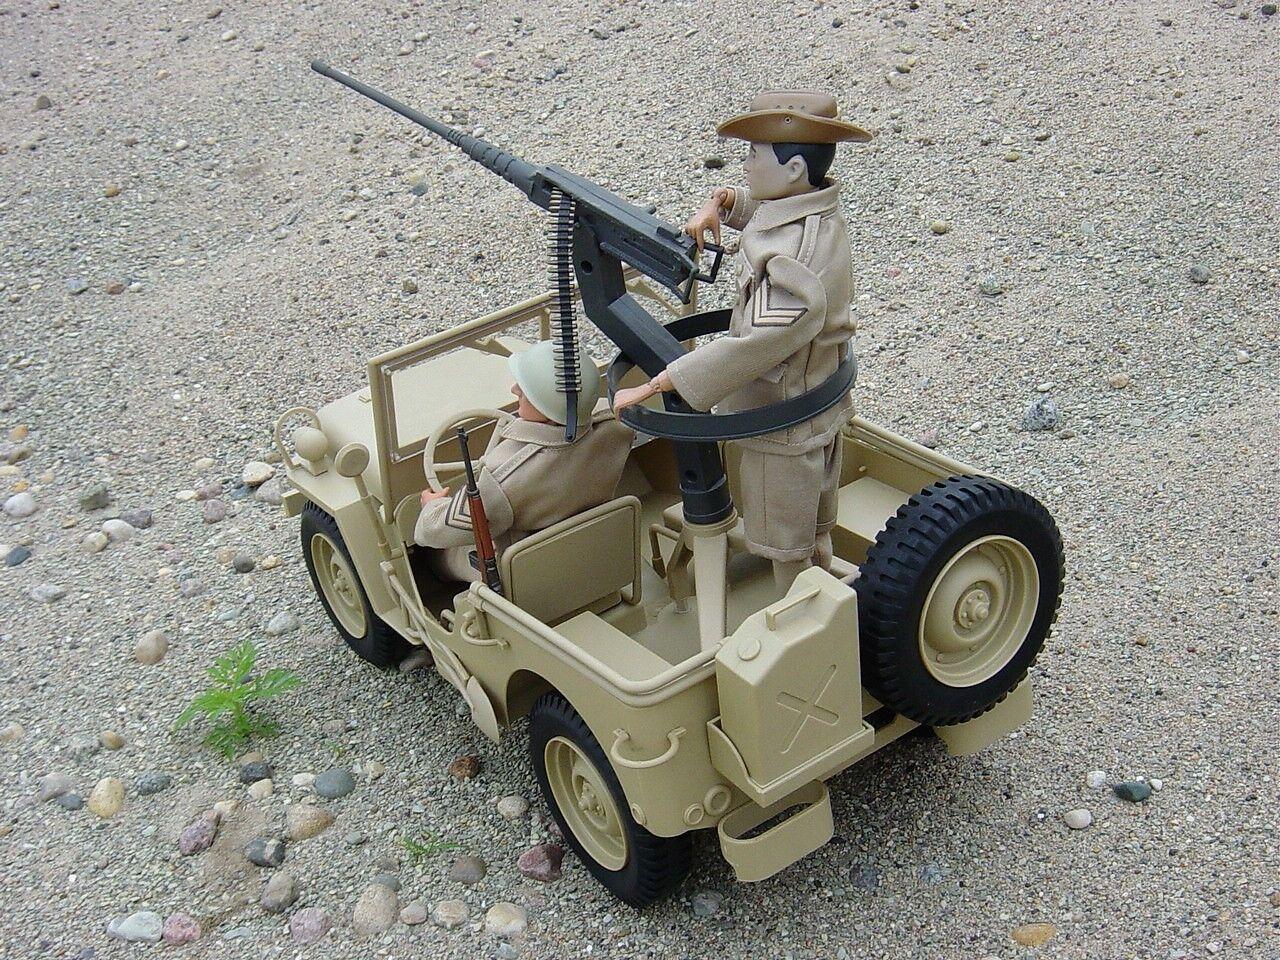 GI Joe Desert Patrol attaque Jeep Tan, James de Simone s'adapte vintage GI JOE